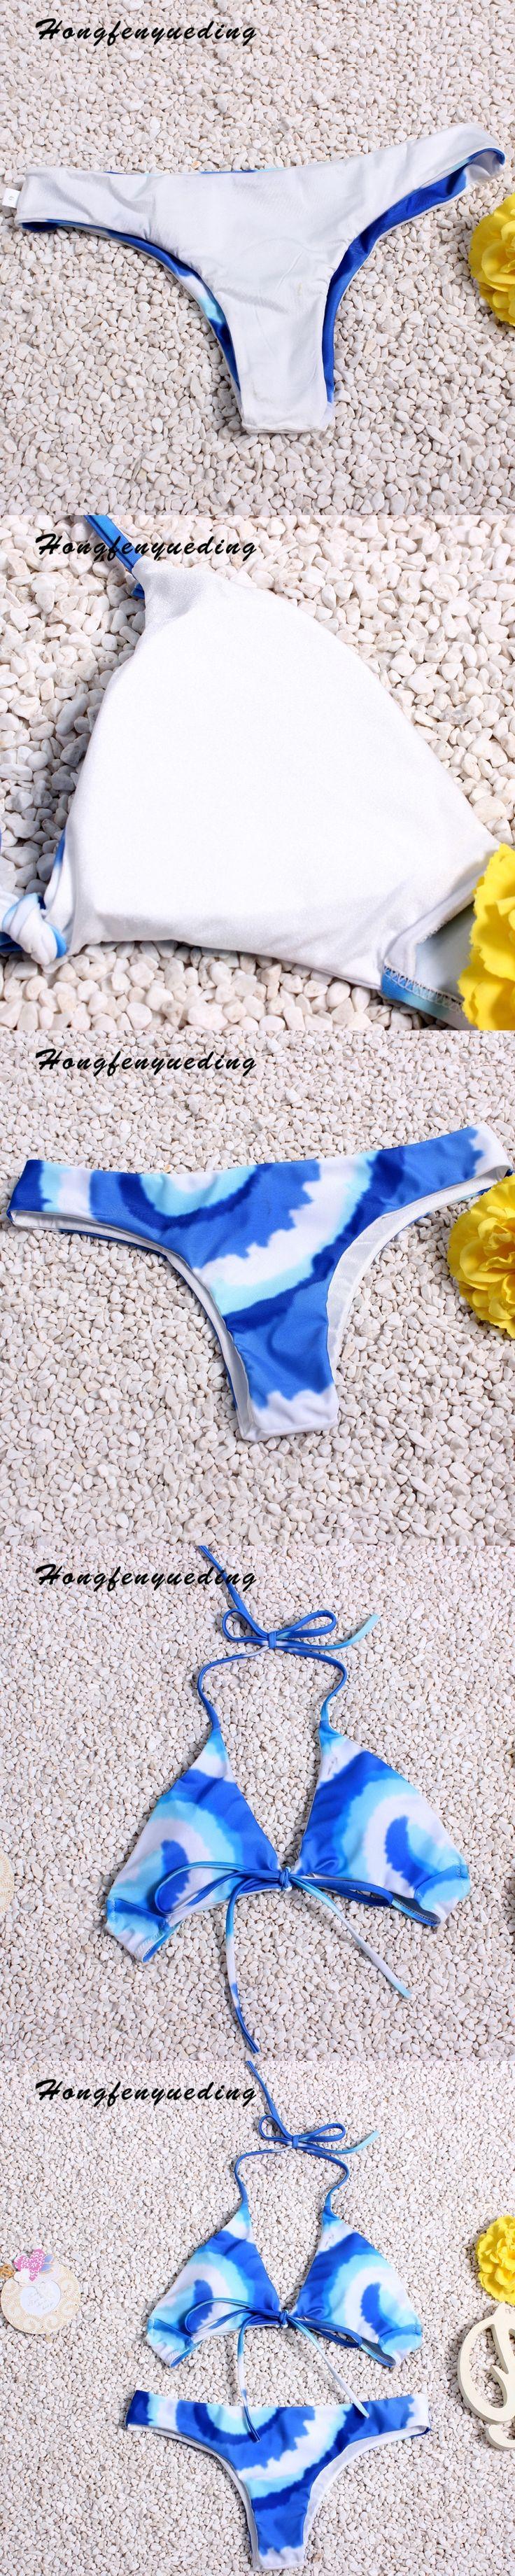 Hongfenyueding Swimsuit Brazilian Bikini 2017 Women's swimming suit Swimwear Women Bandeau Bather Beachwear Maillot De Bain